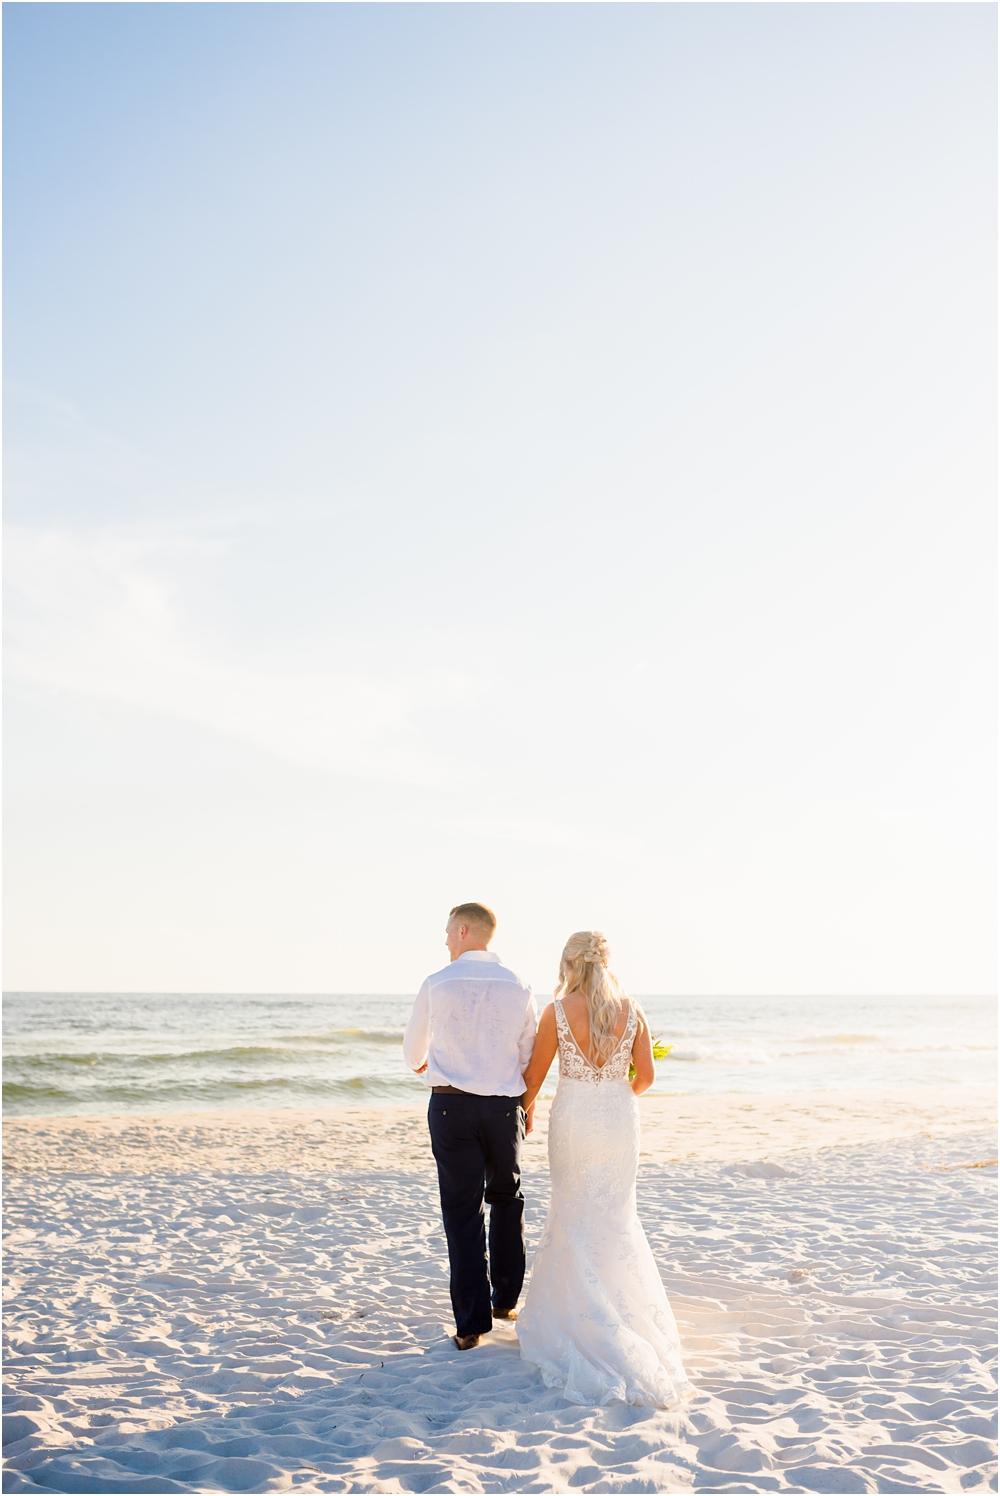 mcglothlin-wedding-kiersten-stevenson-photography-30a-panama-city-beach-dothan-tallahassee-(95-of-145).jpg